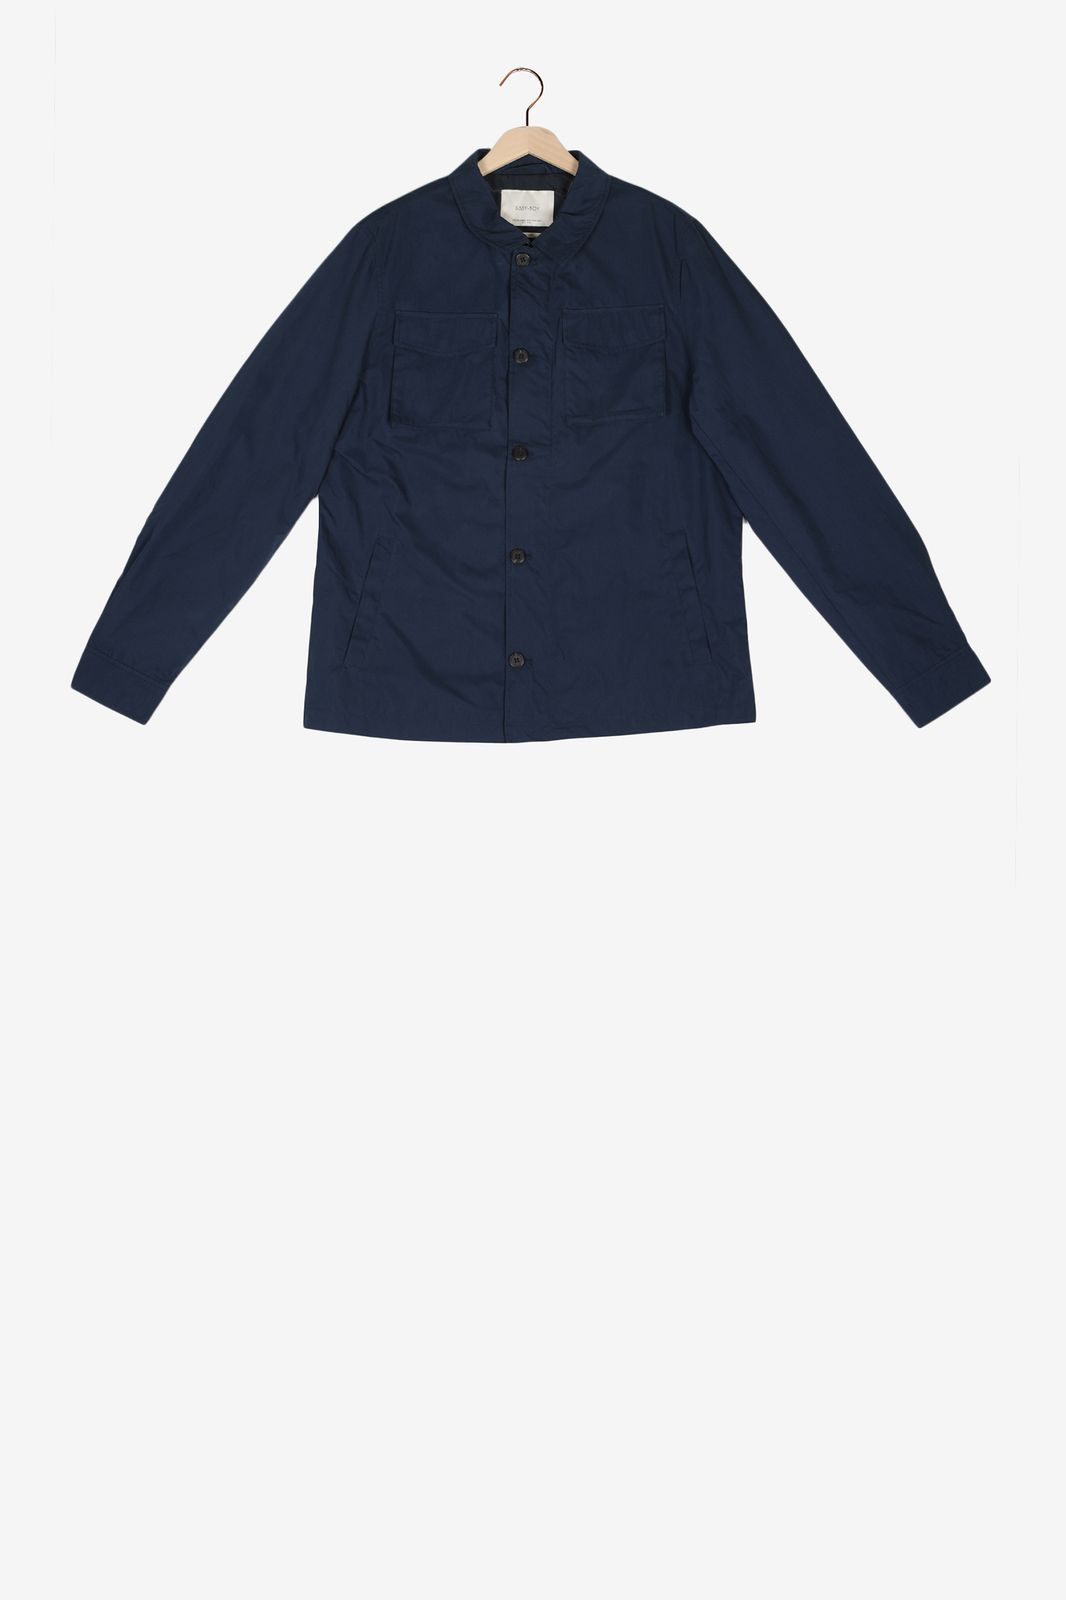 Donkerblauw jack - Heren | Sissy-Boy